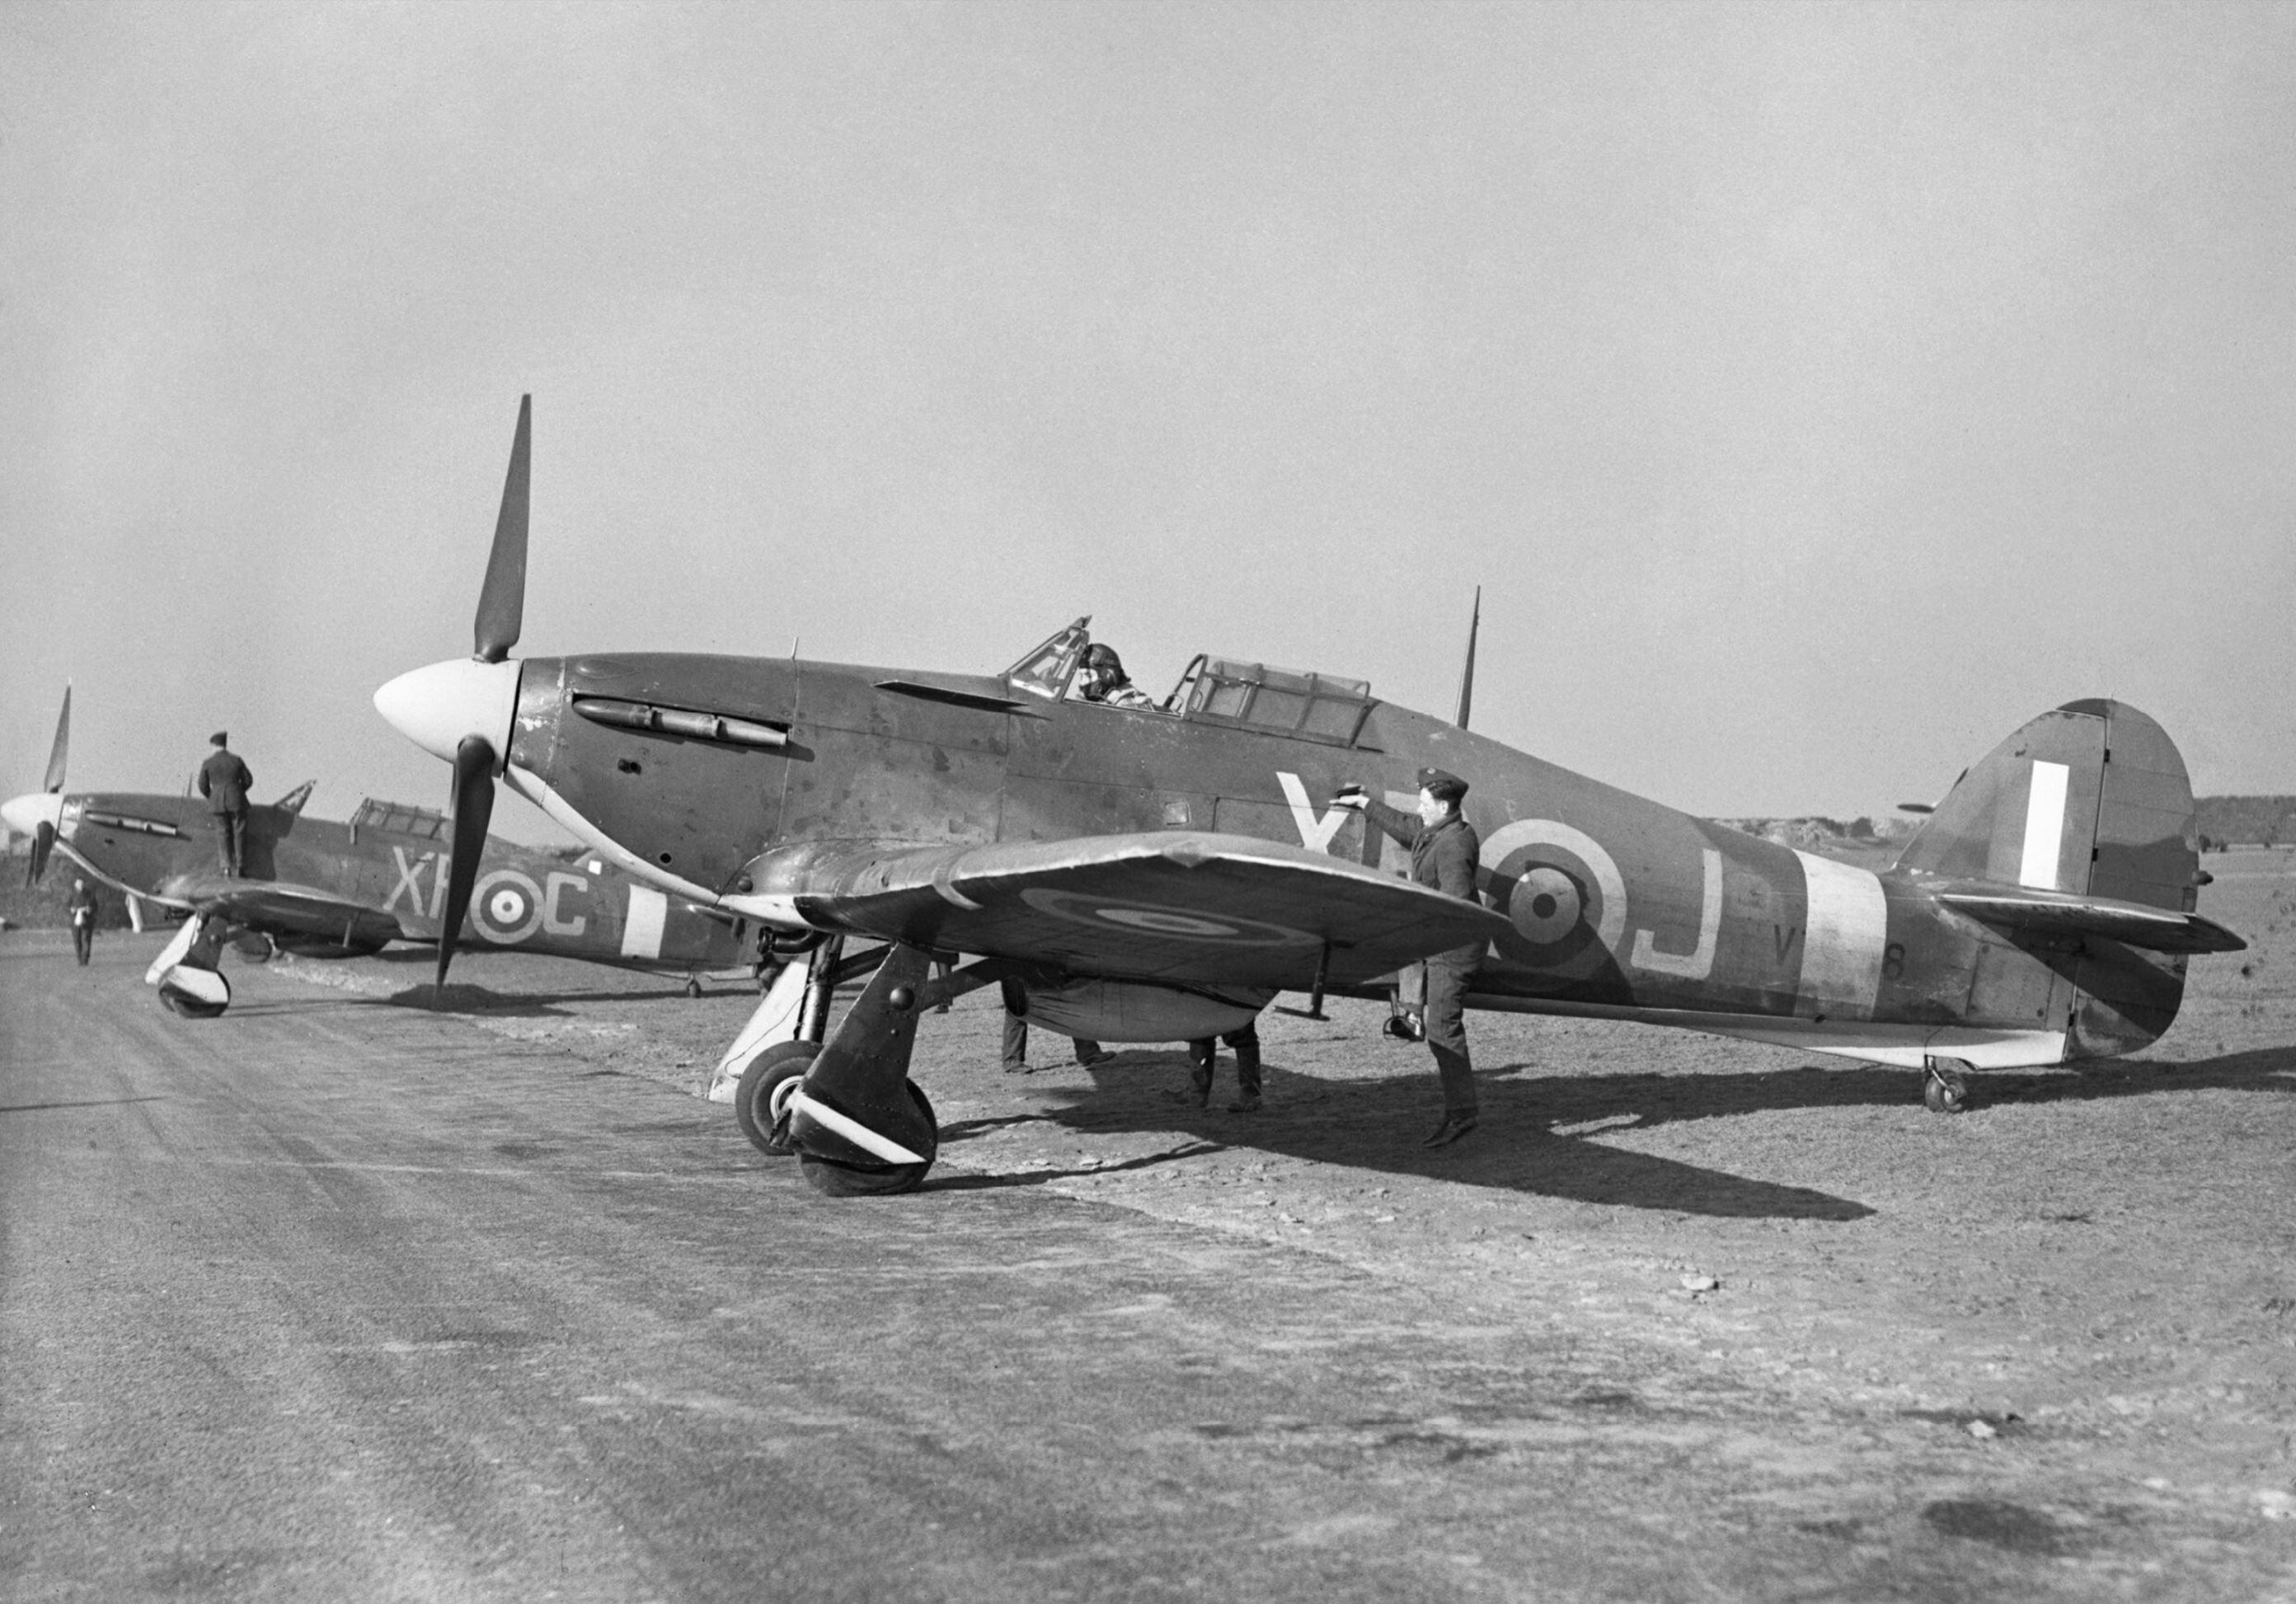 Hawker Hurricane I RAF 71Sqn XRJ V7608 at Kirton in Lindsey Lincolnshire England 1941 CH2412